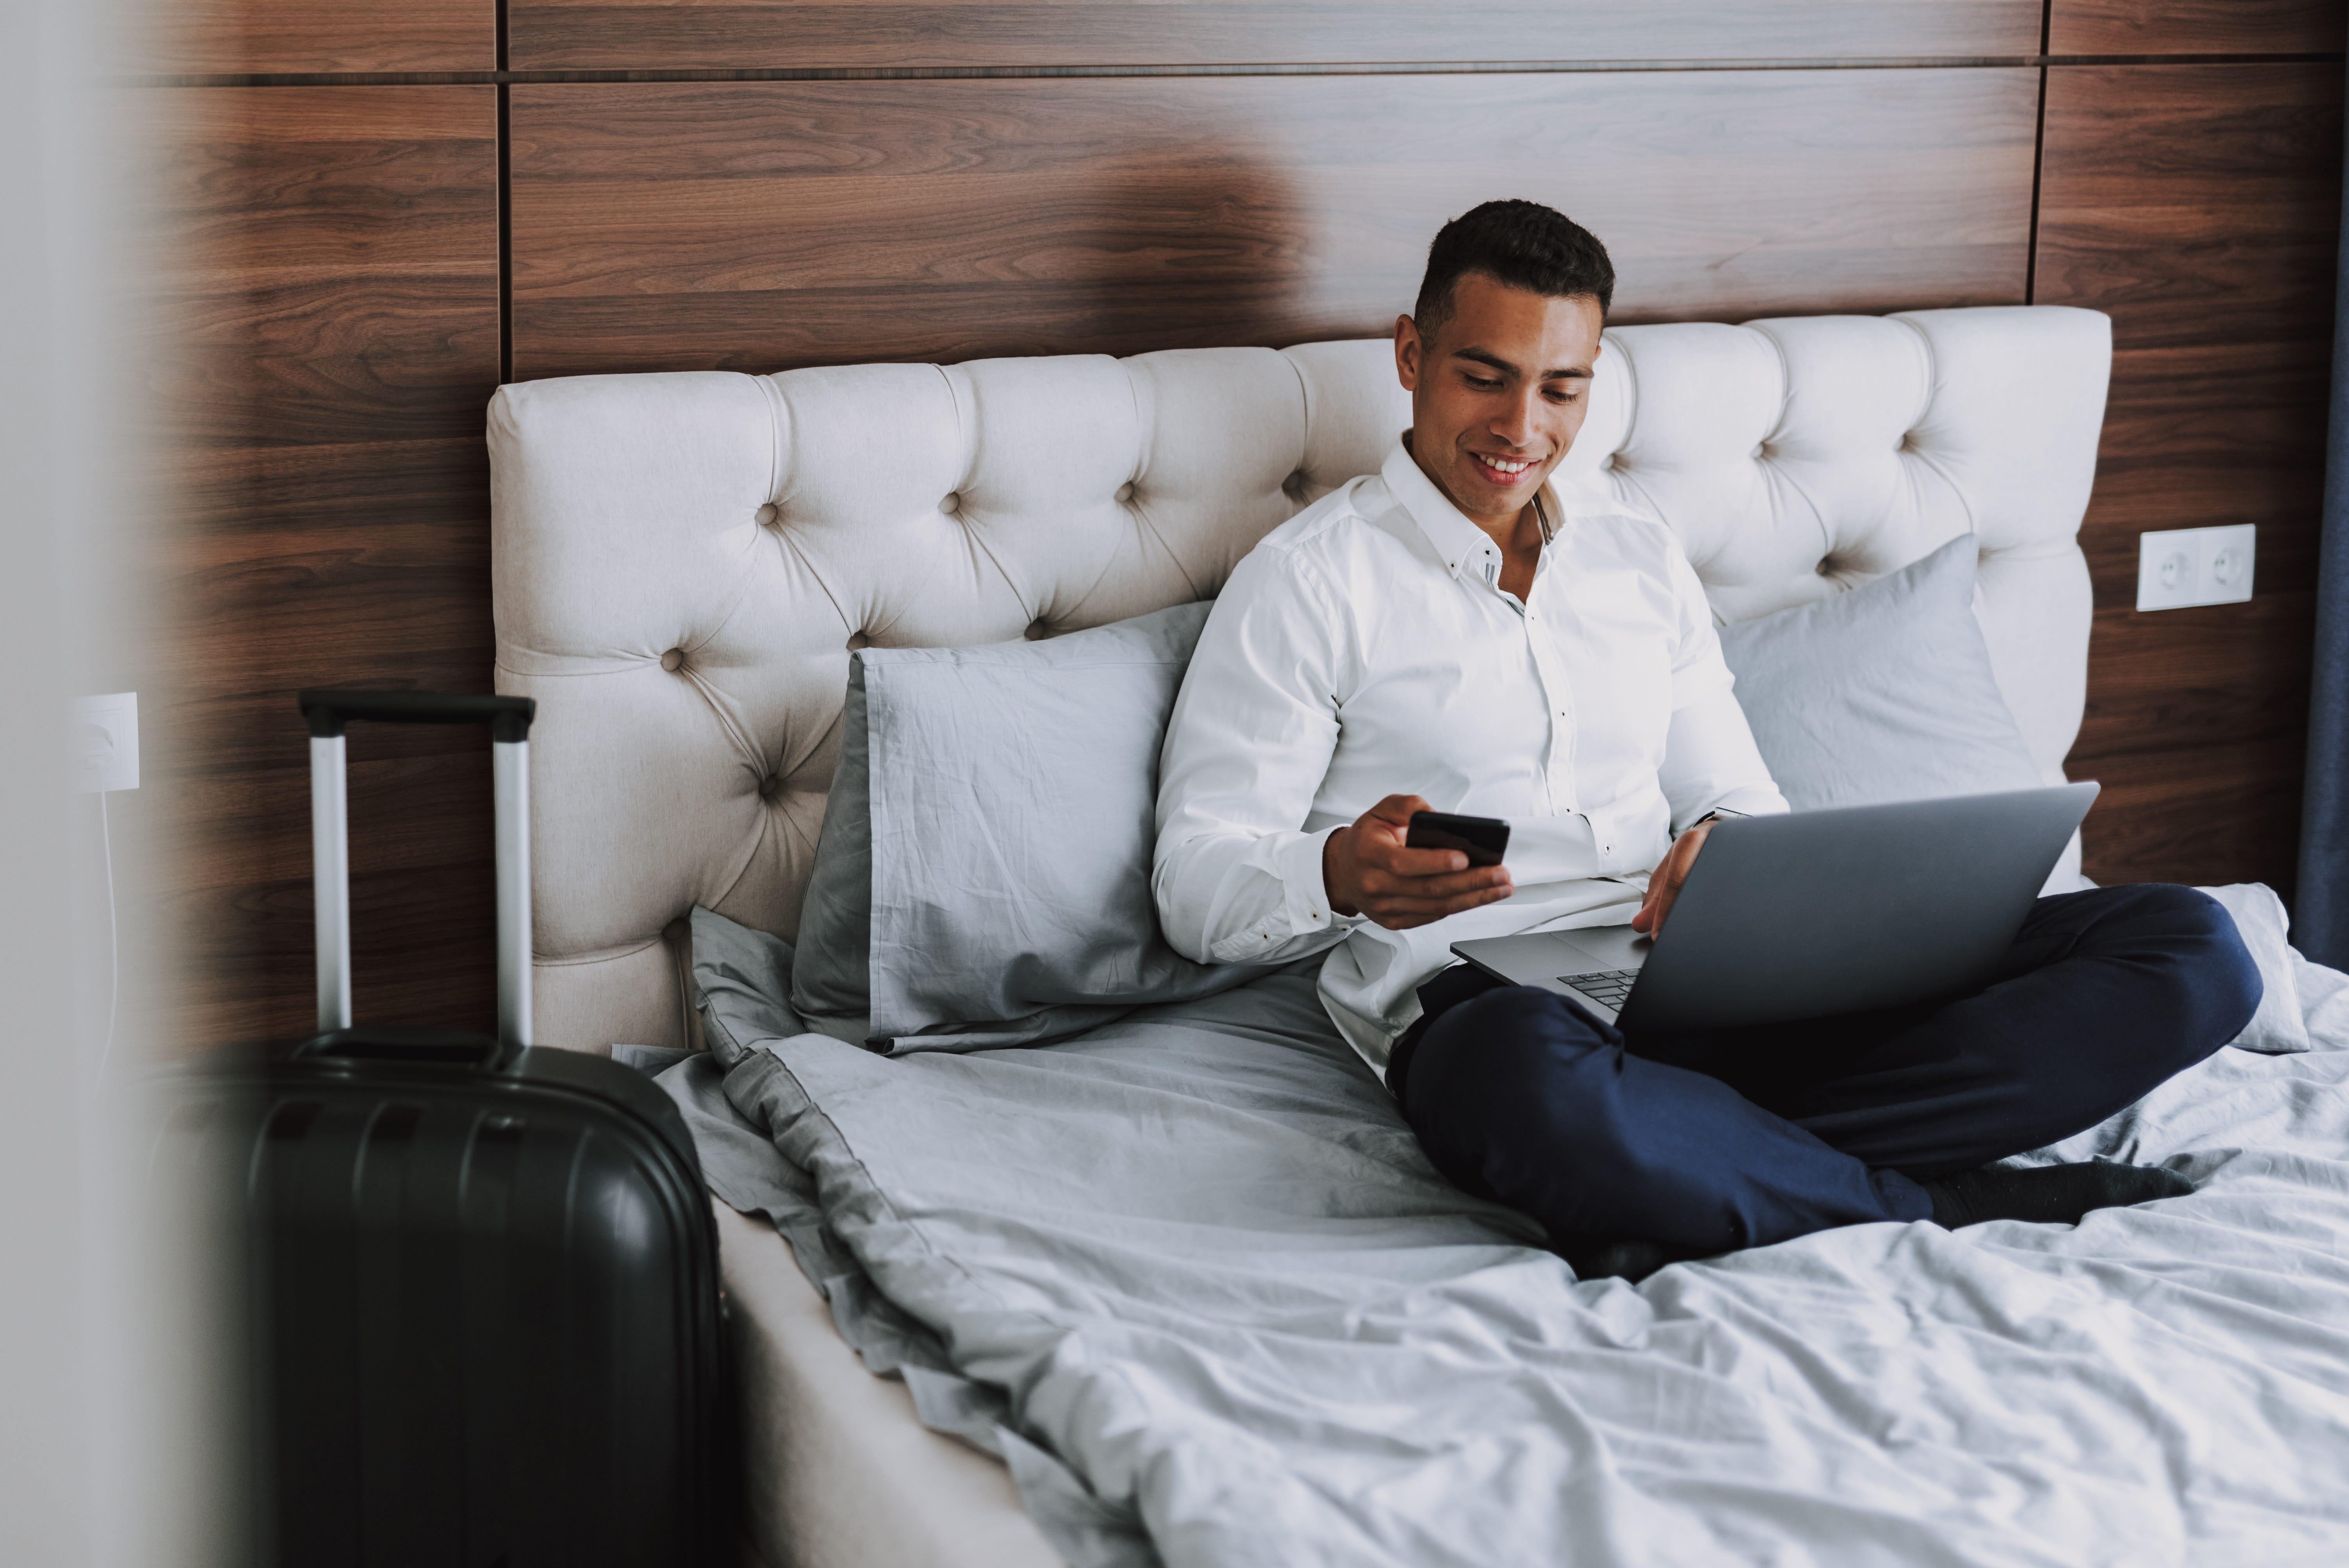 Best hotel loyalty programs, according to readers